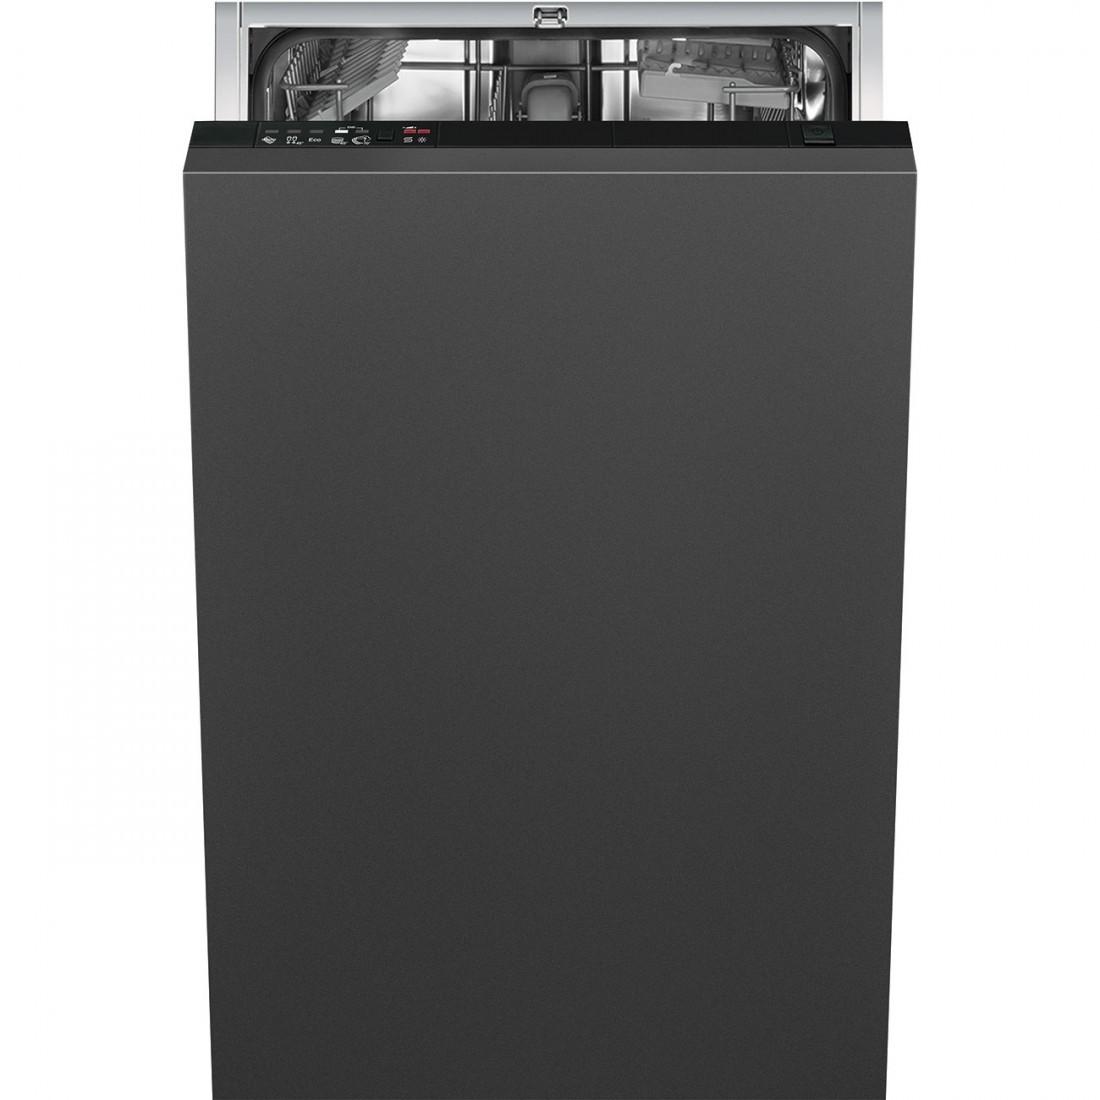 Lavavajillas Smeg St65221 45cm A+ Integrable Negro